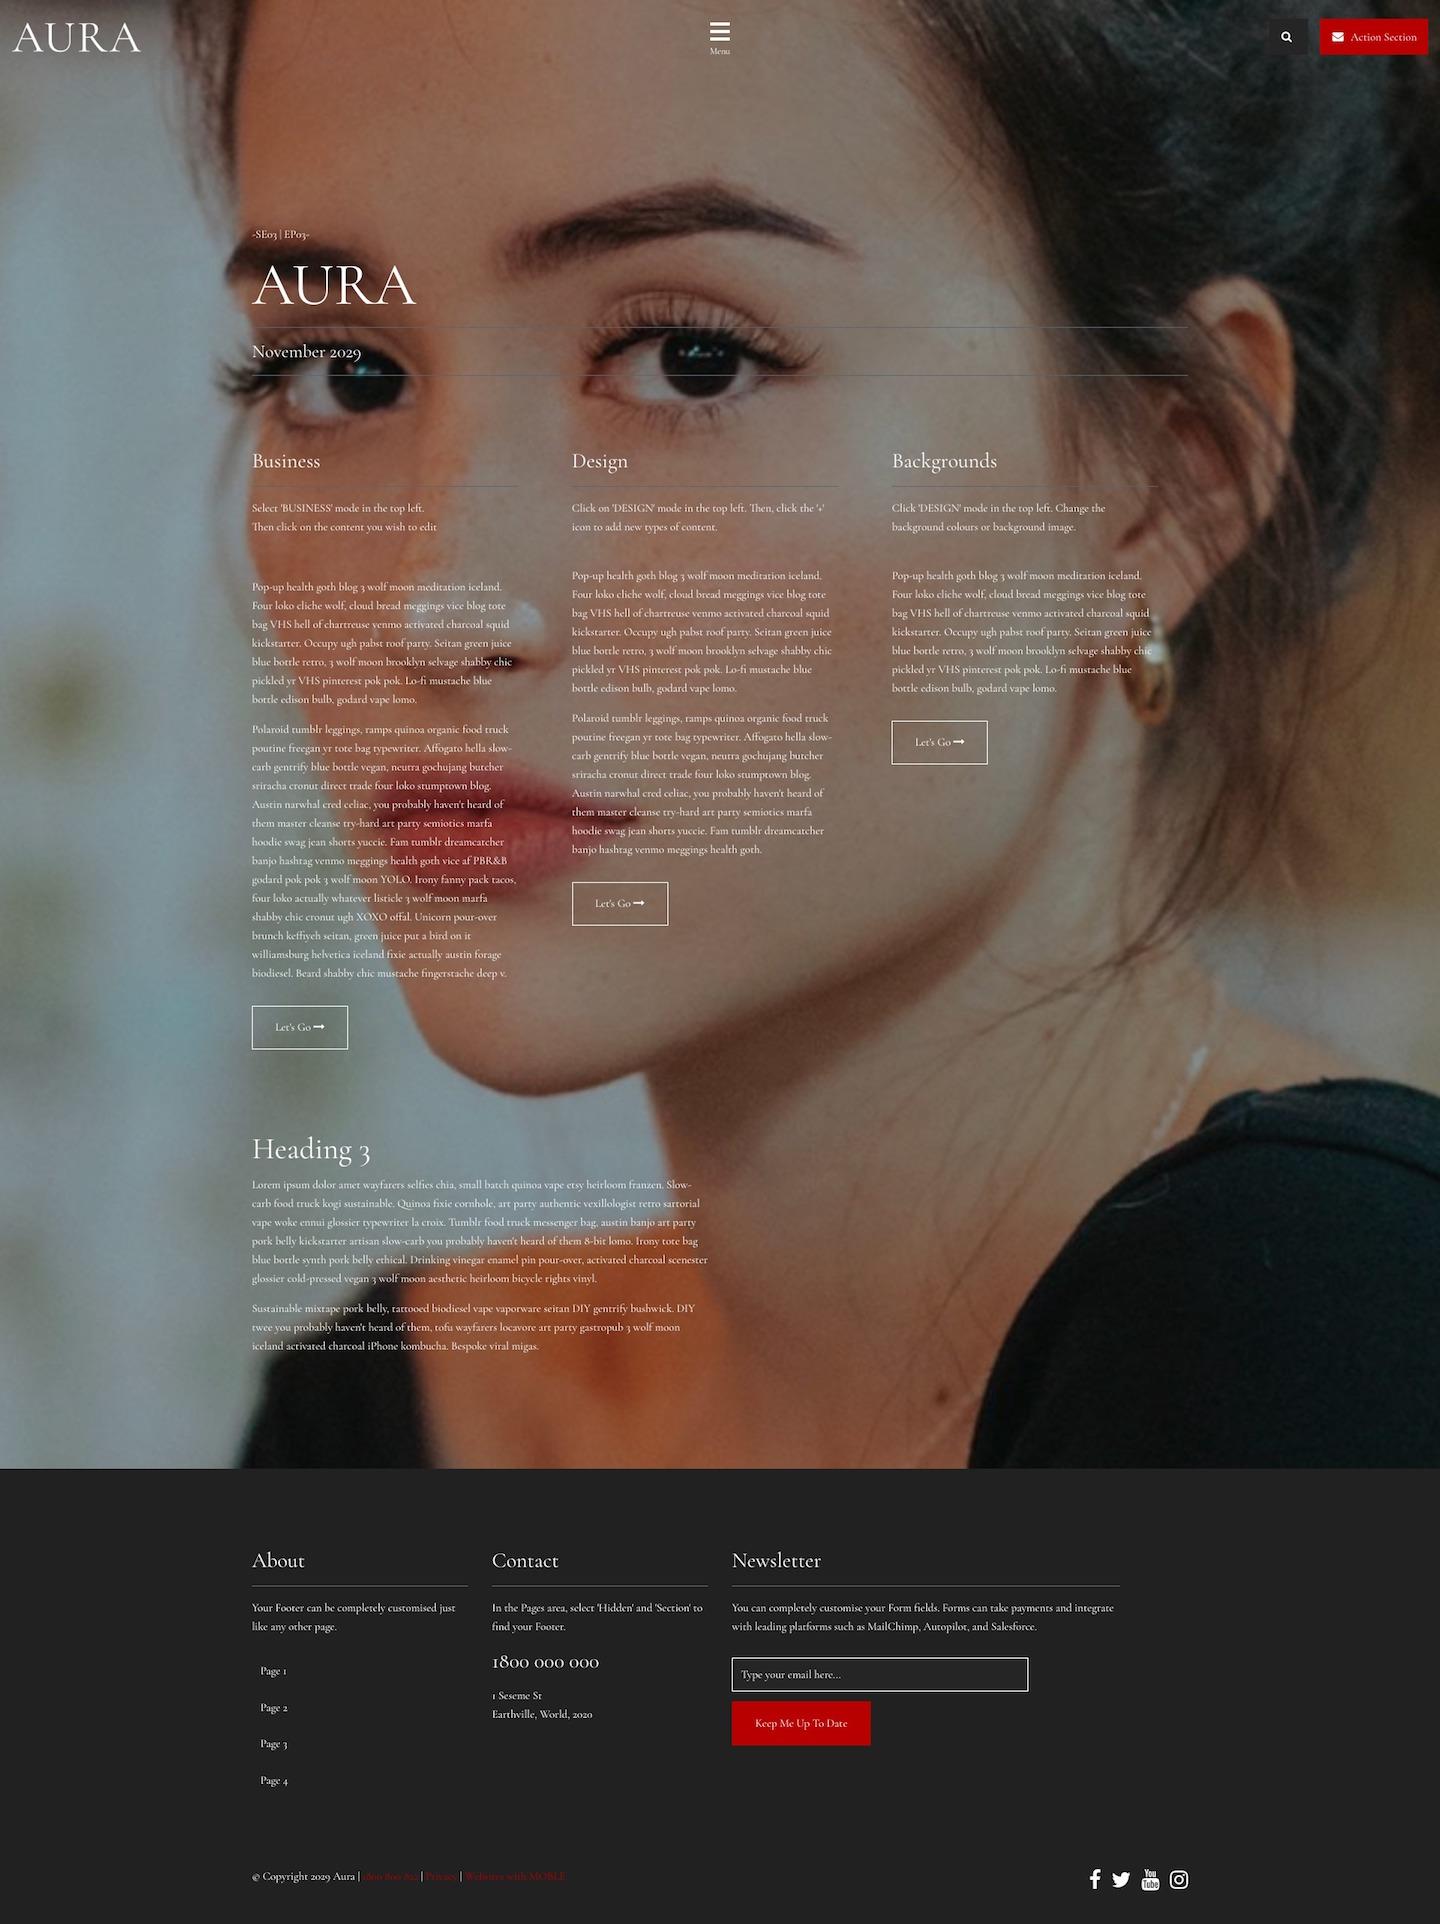 Aura Website Design